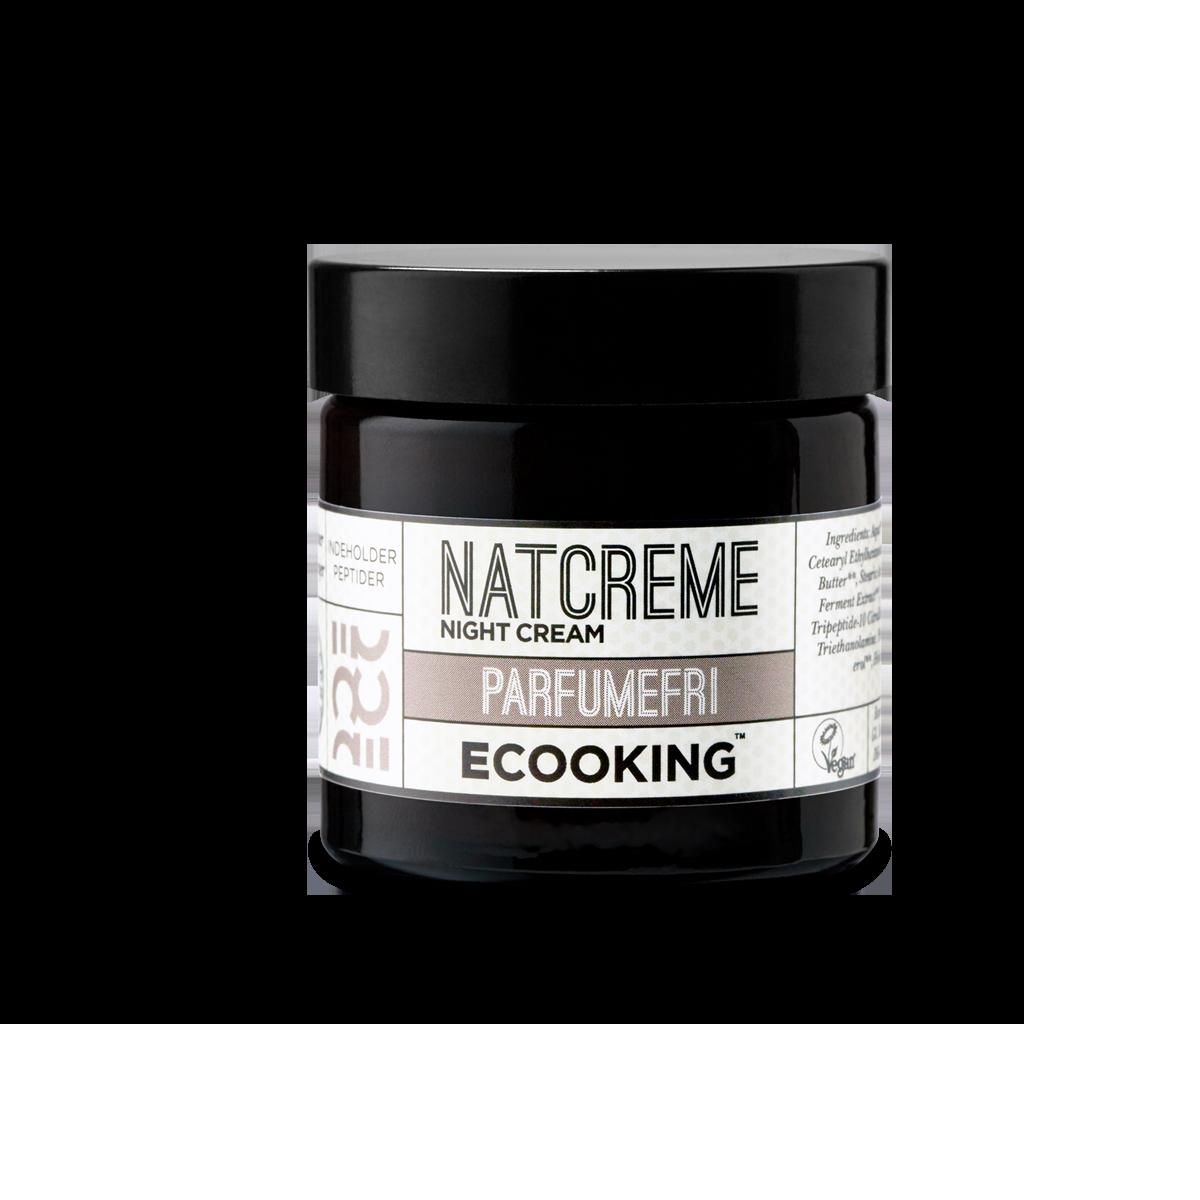 Ecooking NATCREME Parfumefri